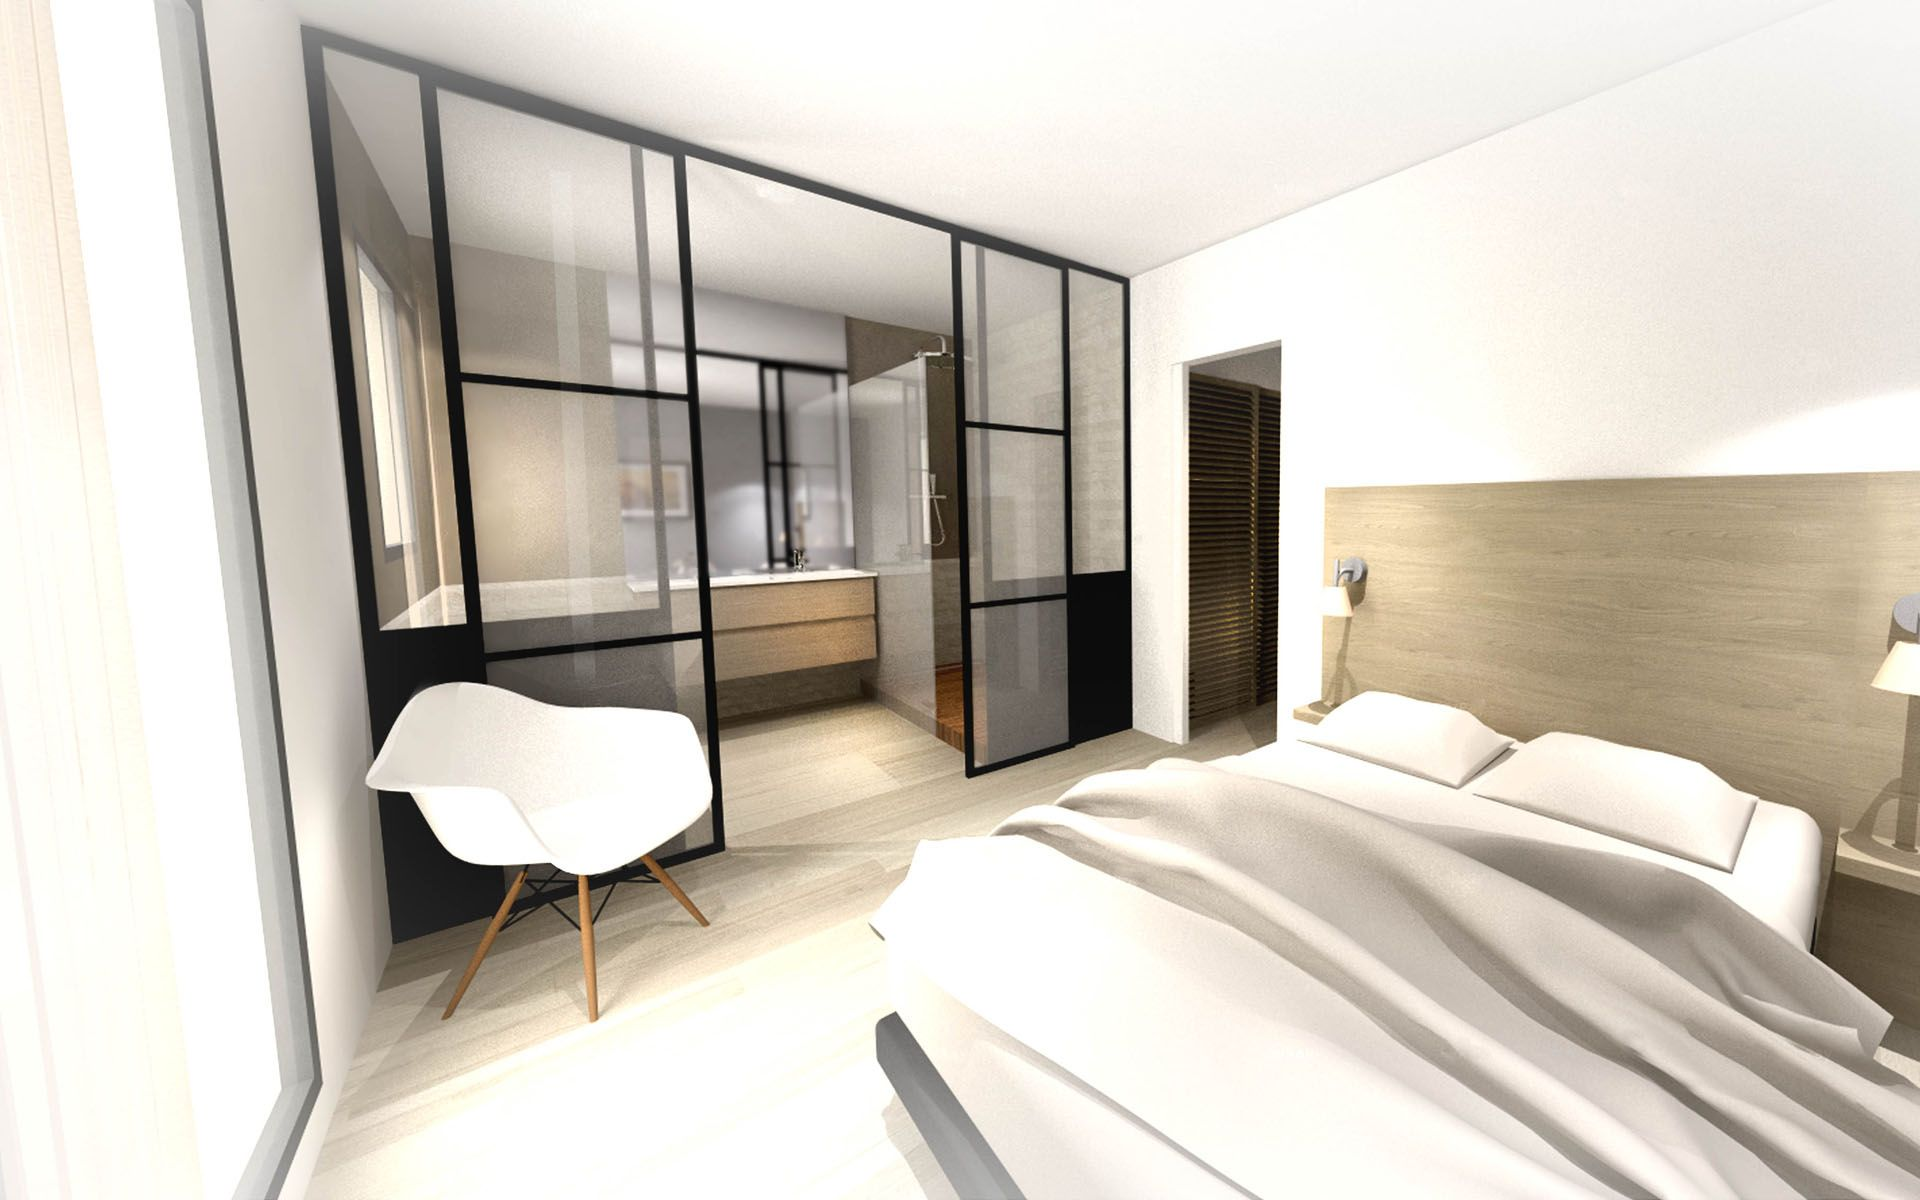 résidence - aix en provence - red banana studio architecte d ... - Architecte D Interieur Aix En Provence